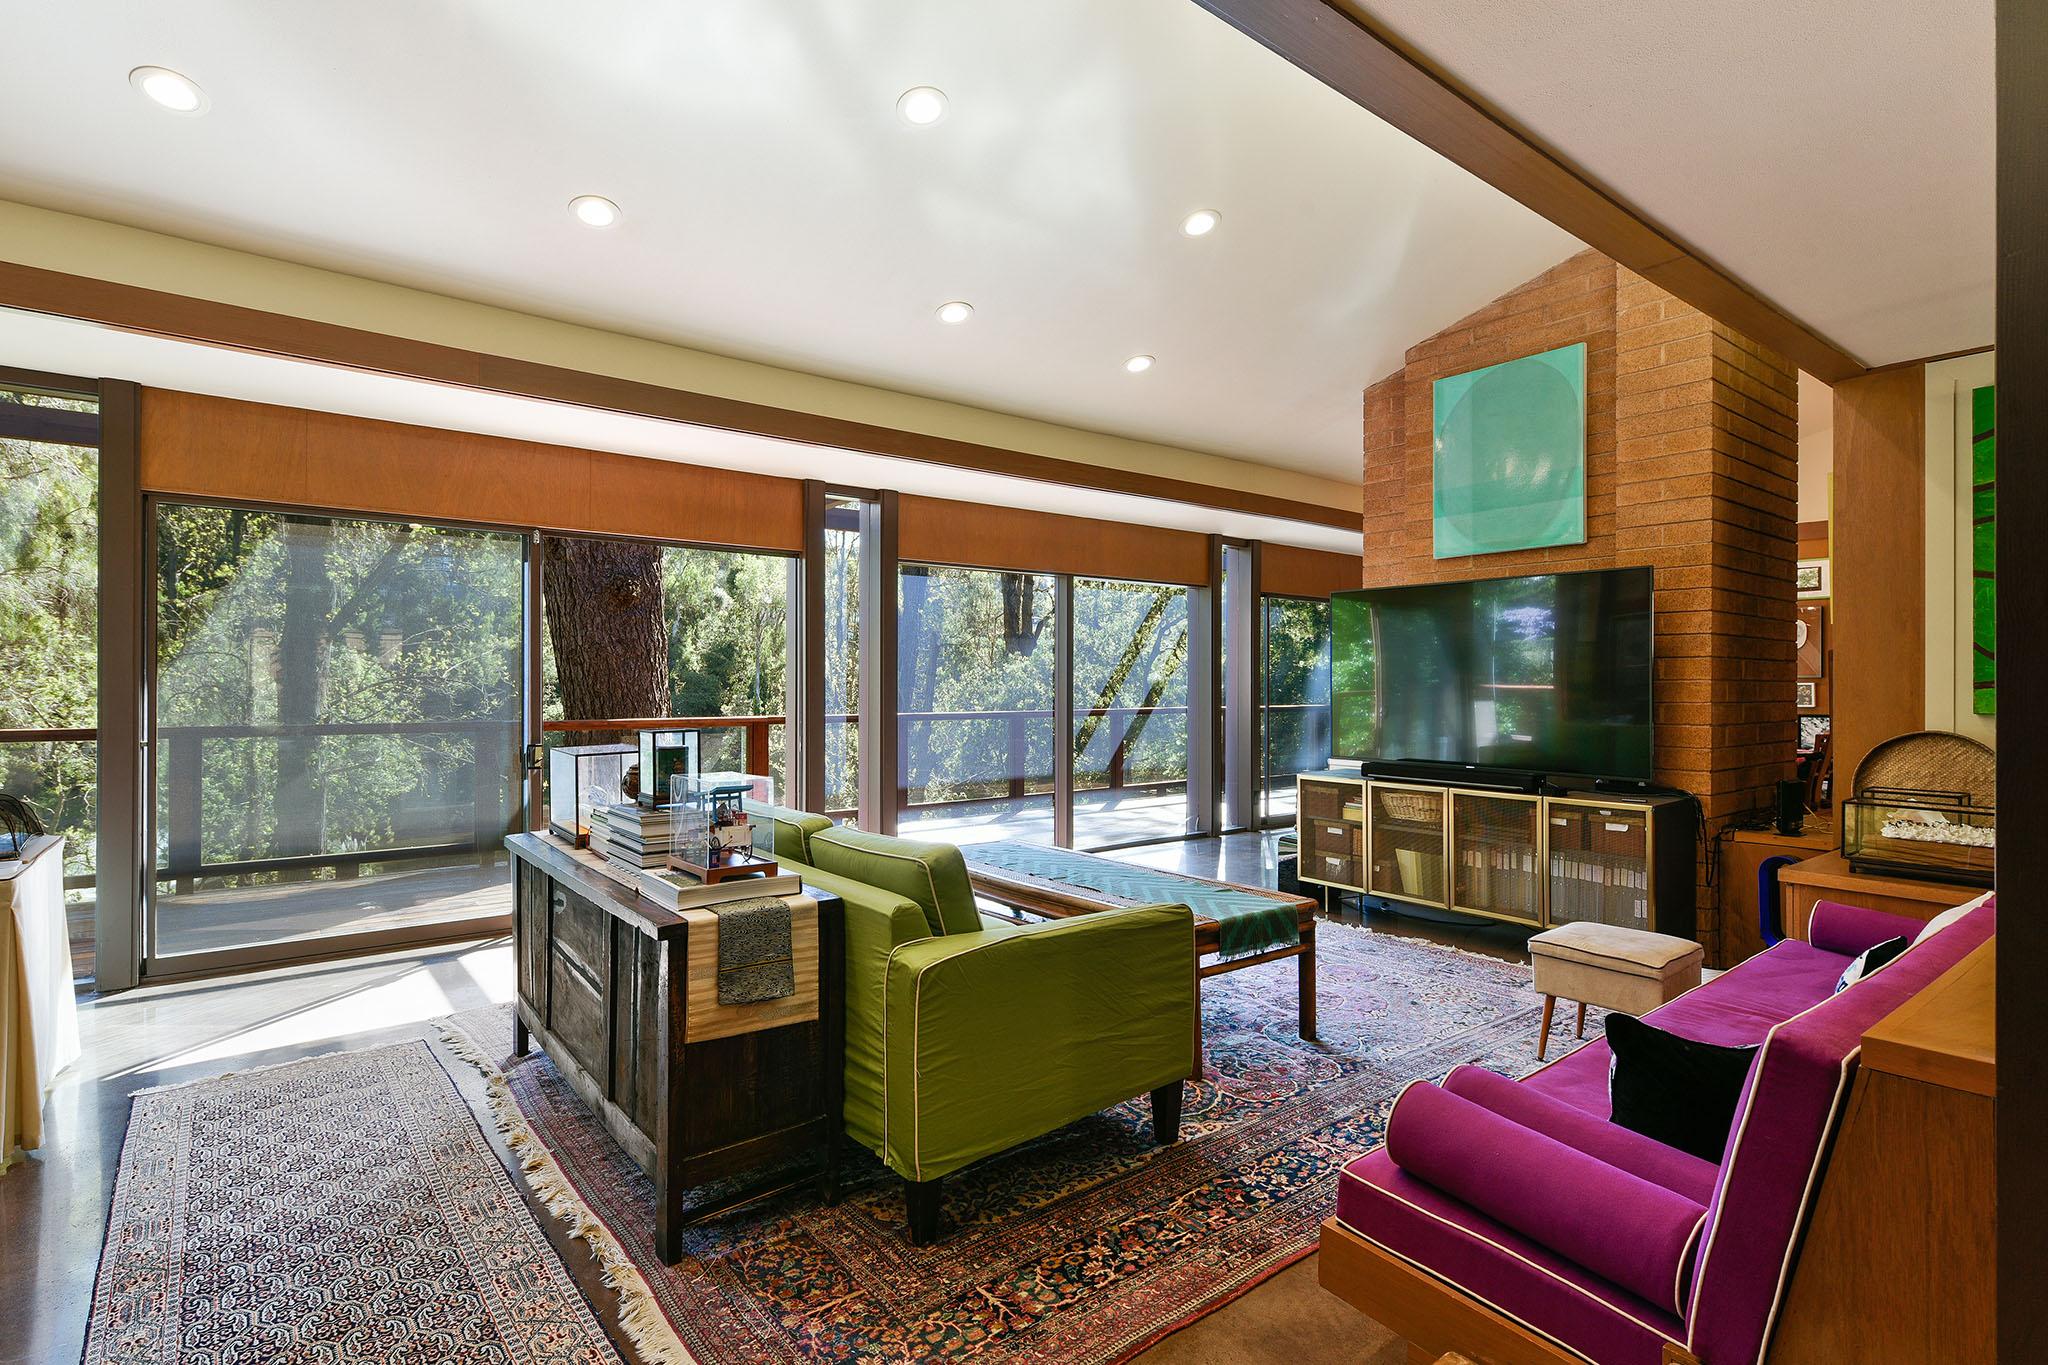 42 Sotelo Avenue - Sold